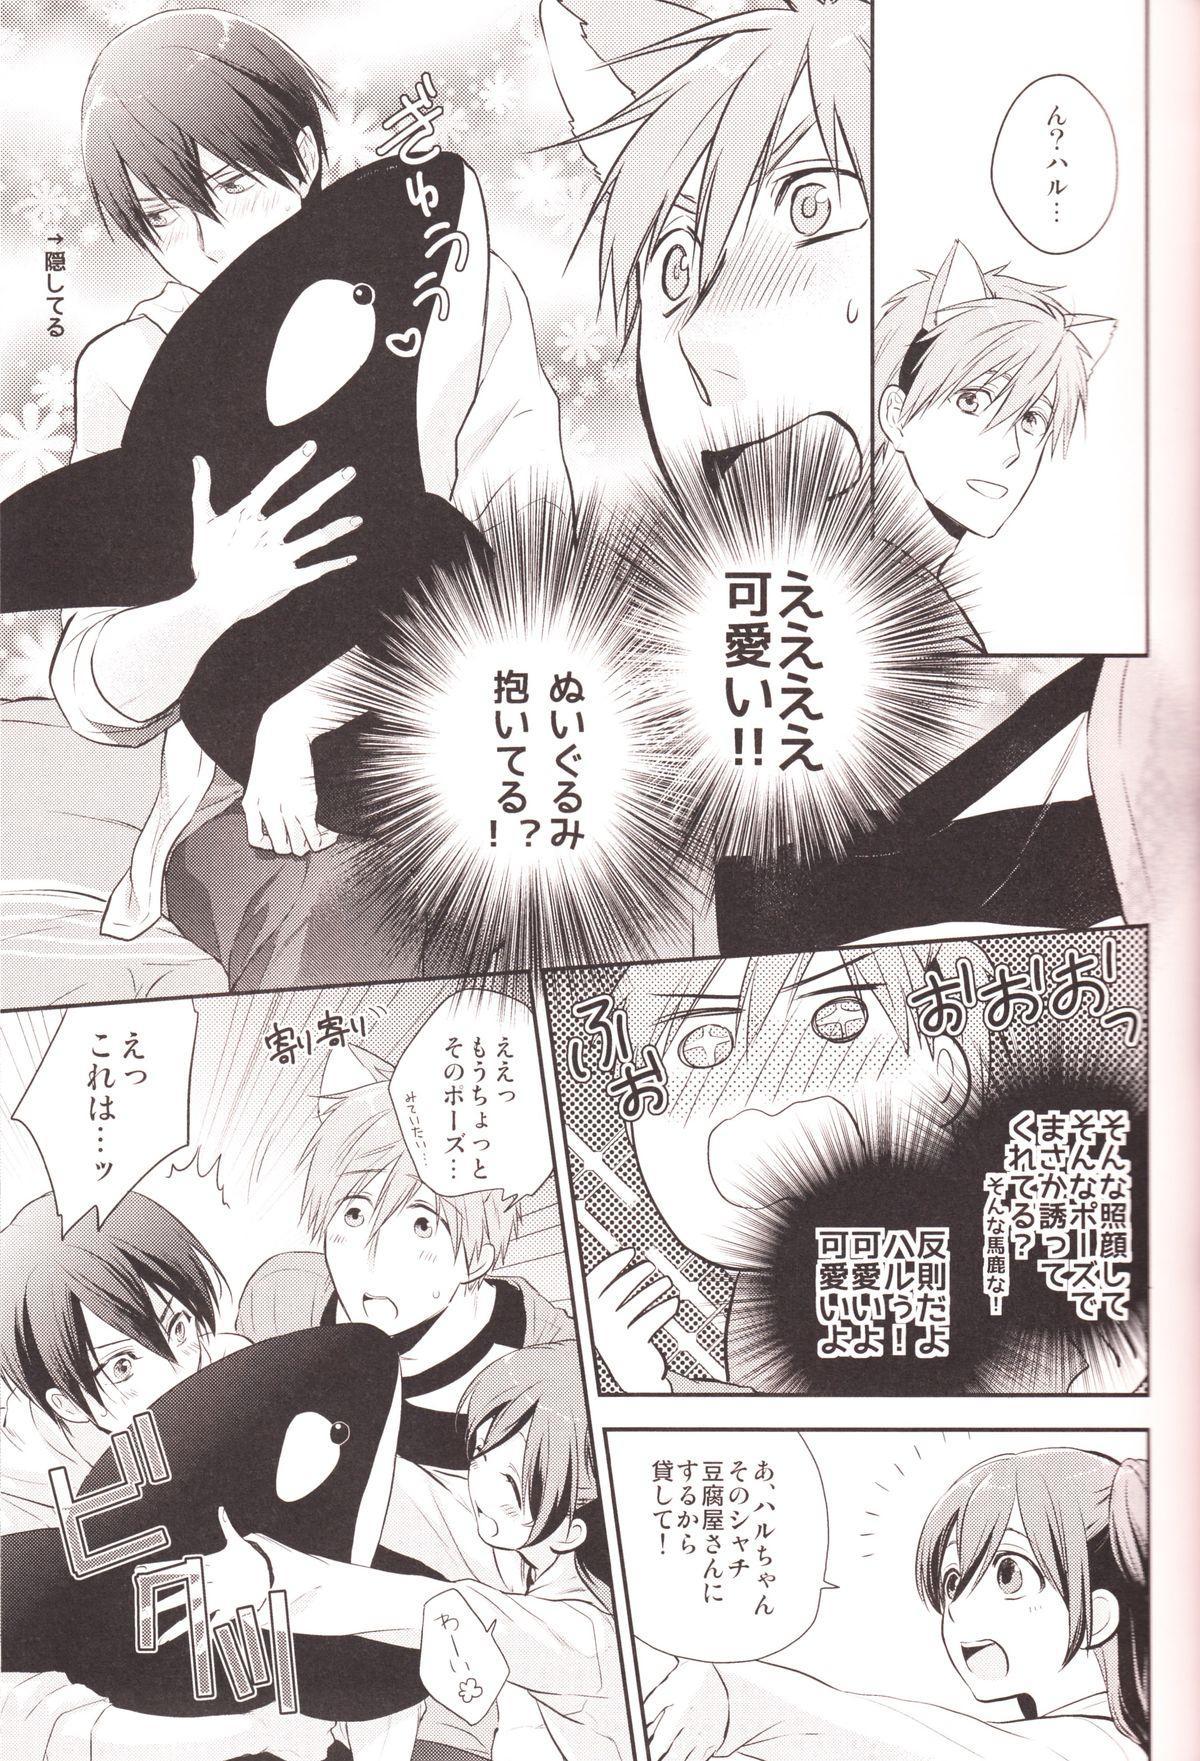 Haru-chan no Wanko 13